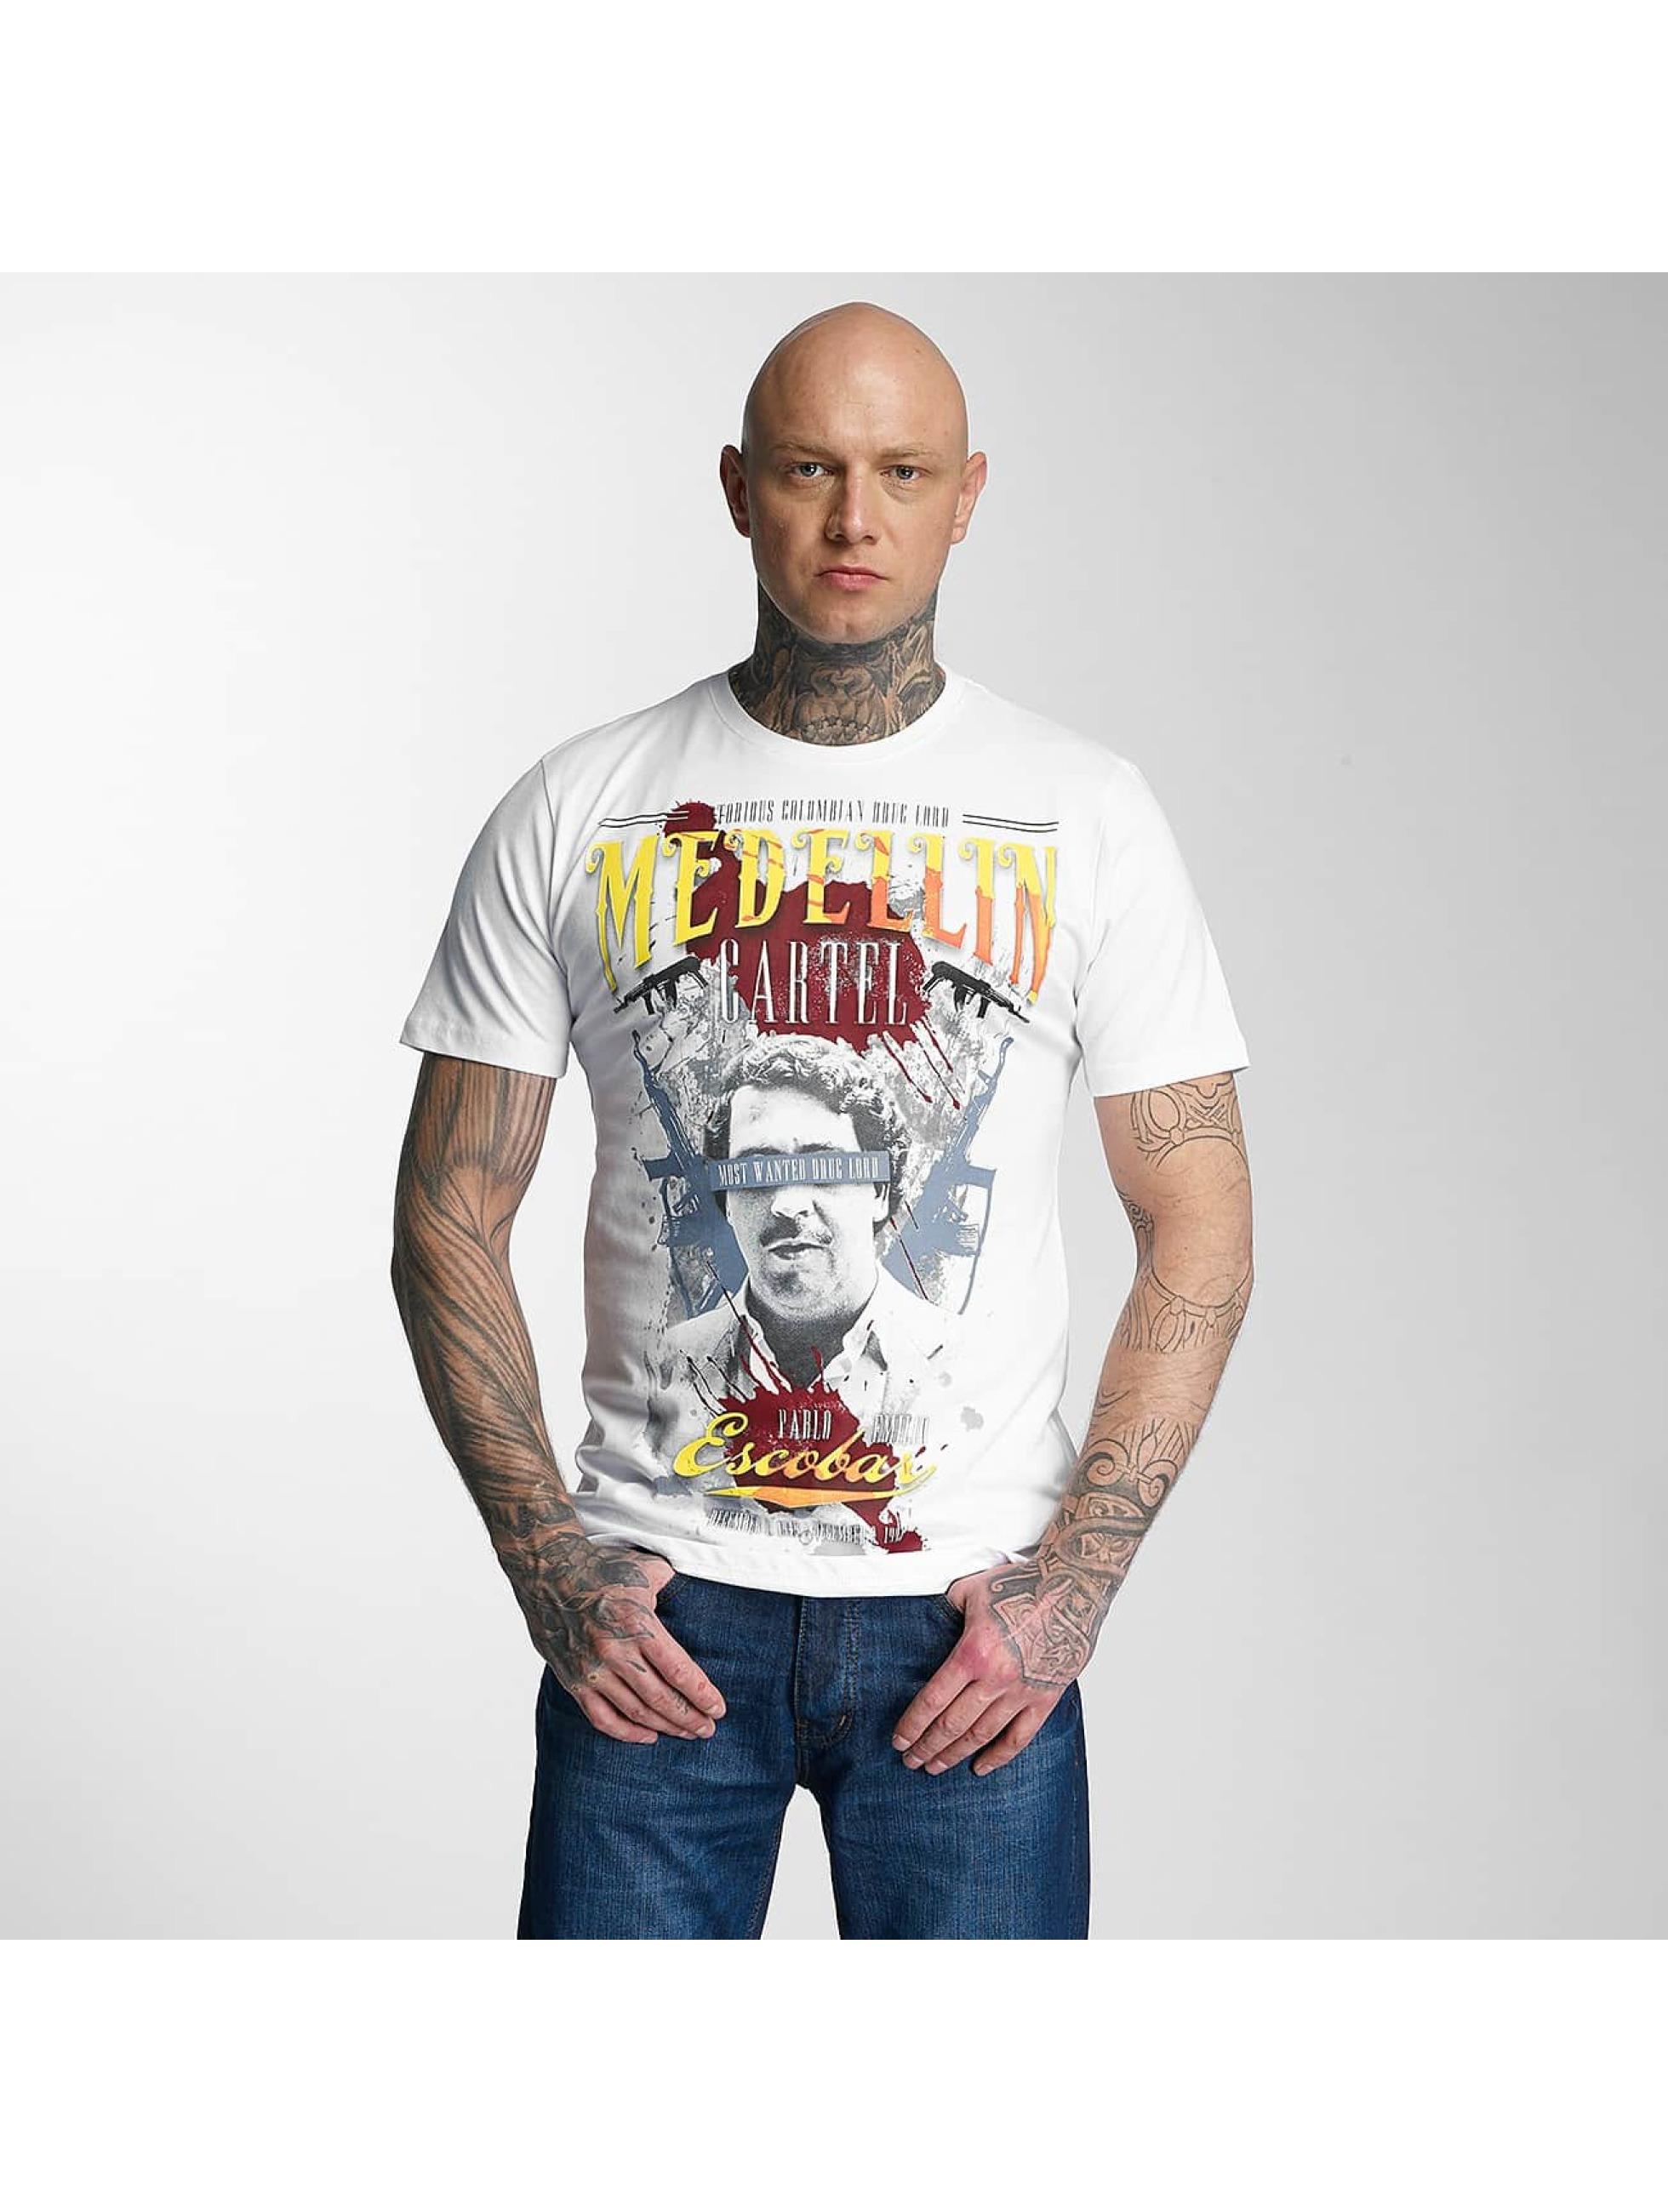 Mafia & Crime Männer T-Shirt Medellin Escobar in weiß